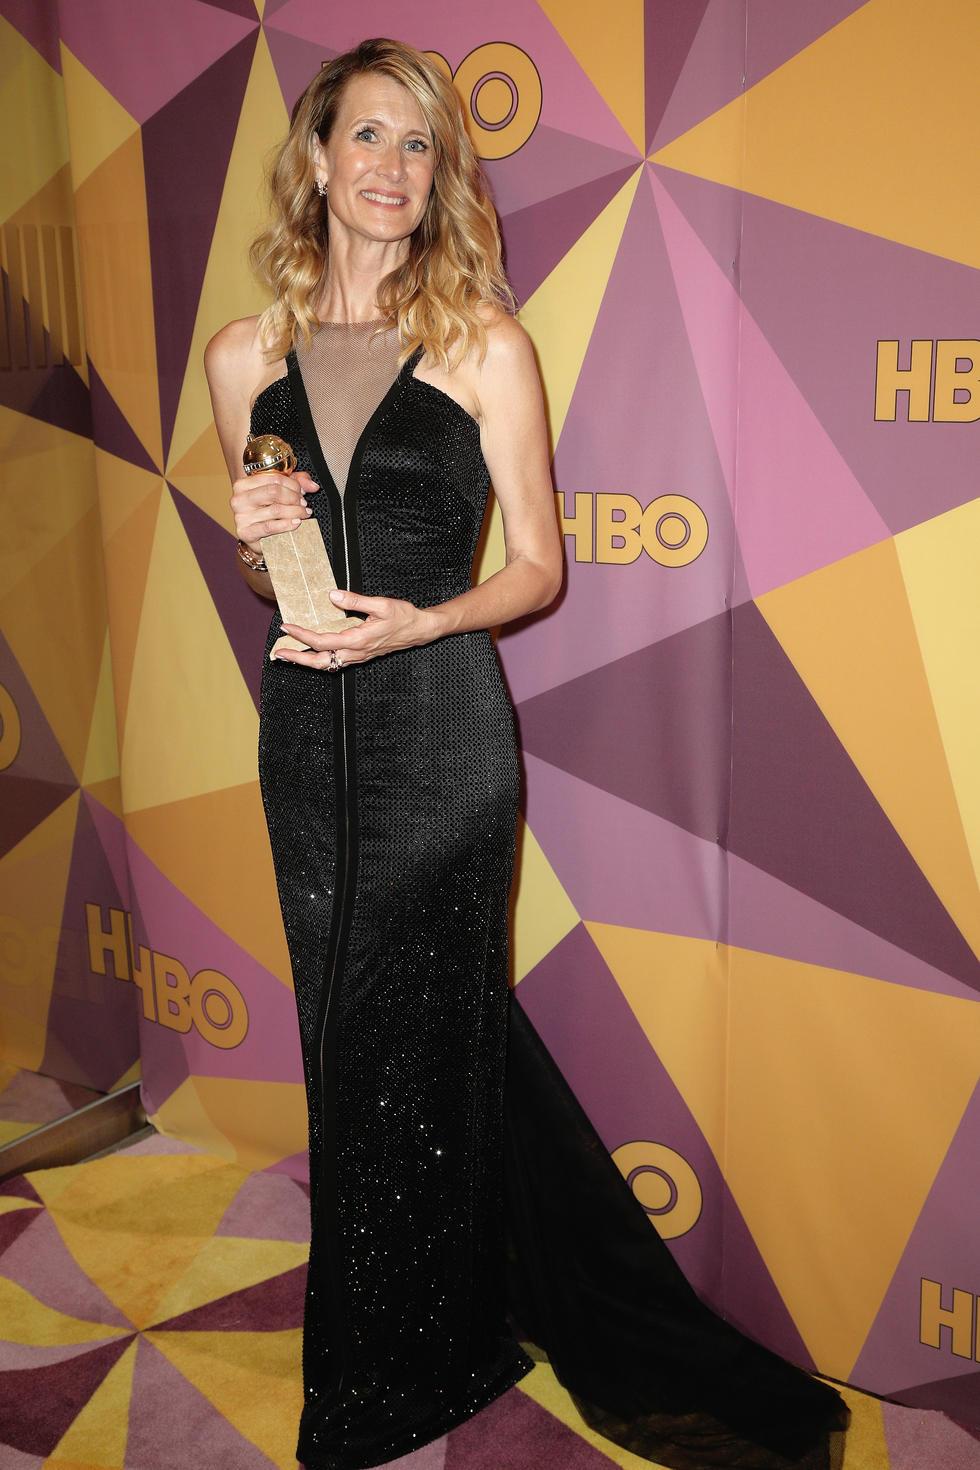 Award winner and 'Big Little Lies' star Laura Dern in Giorgio Armani